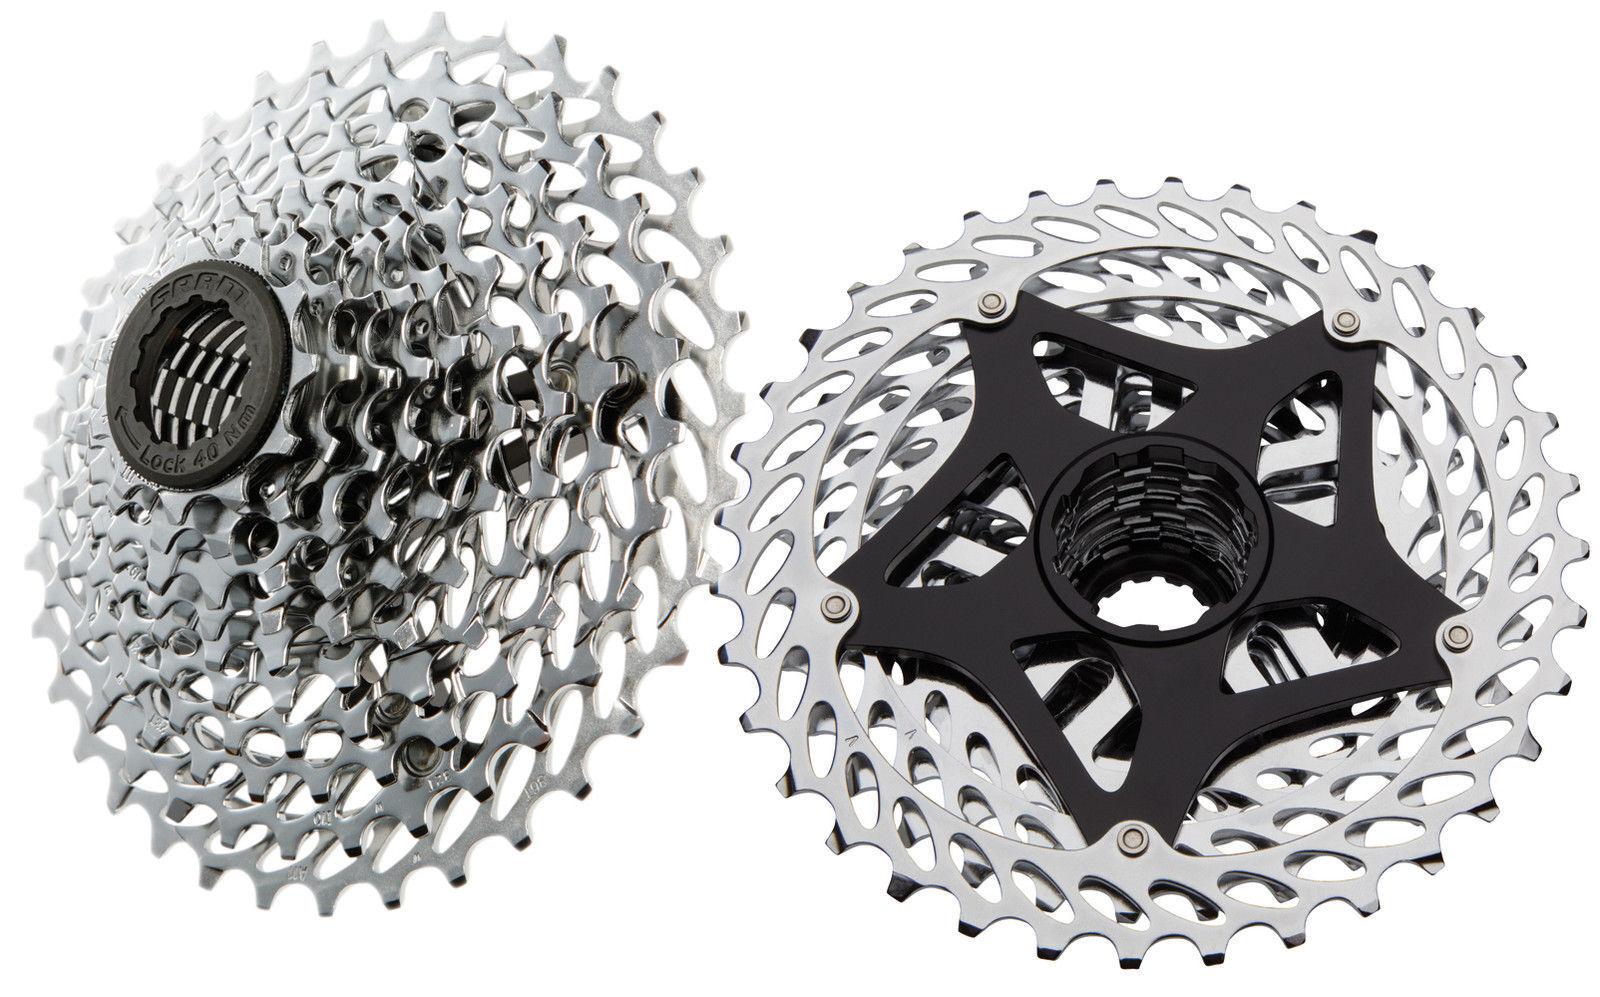 SRAM PG-1030 11-32 10 Speed Mountain Bike Cassette Fits XX X0 X9 X7 X5 32t 11 32